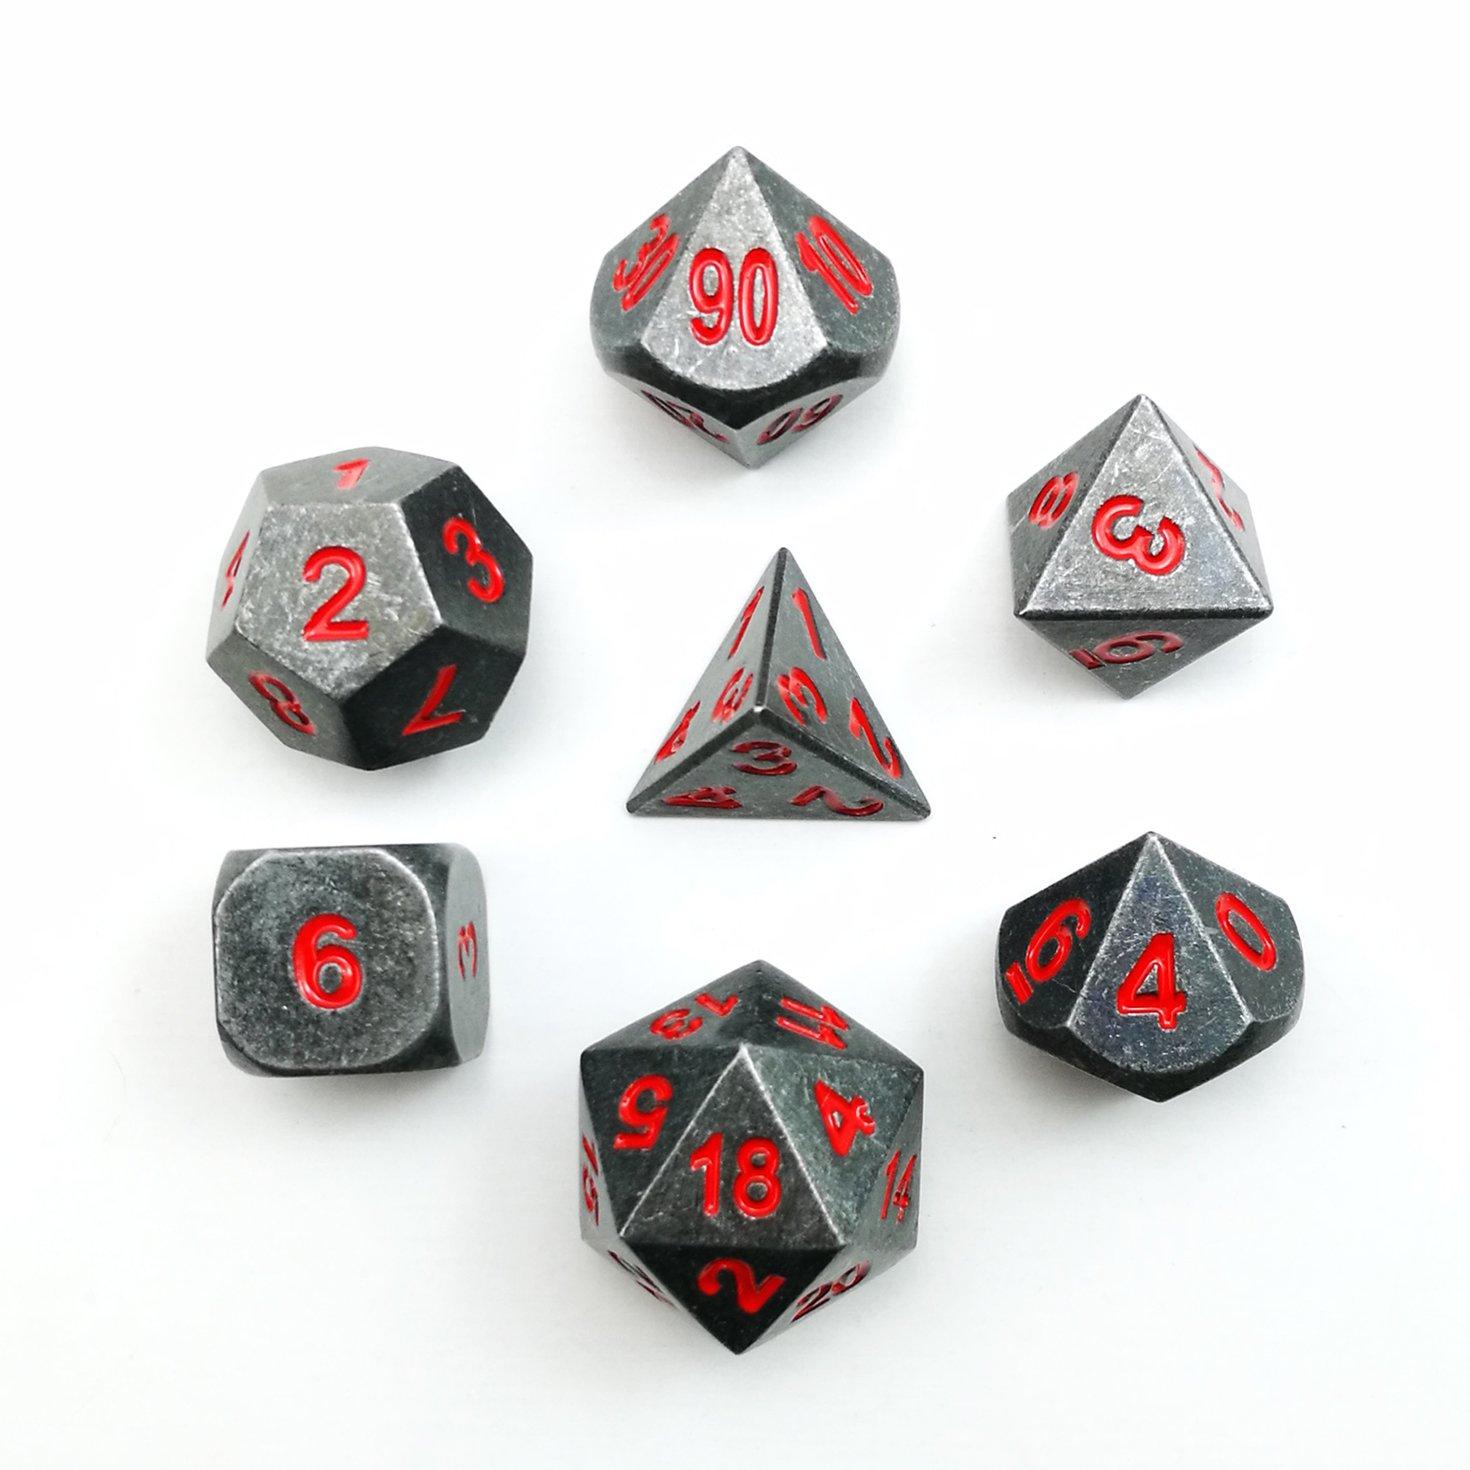 Metallic 7pcs Dungeons and Dragons Dice Set, Metal RPG Game Dice with Red Number, Metallic 7pcs Polyhedral Dice Set